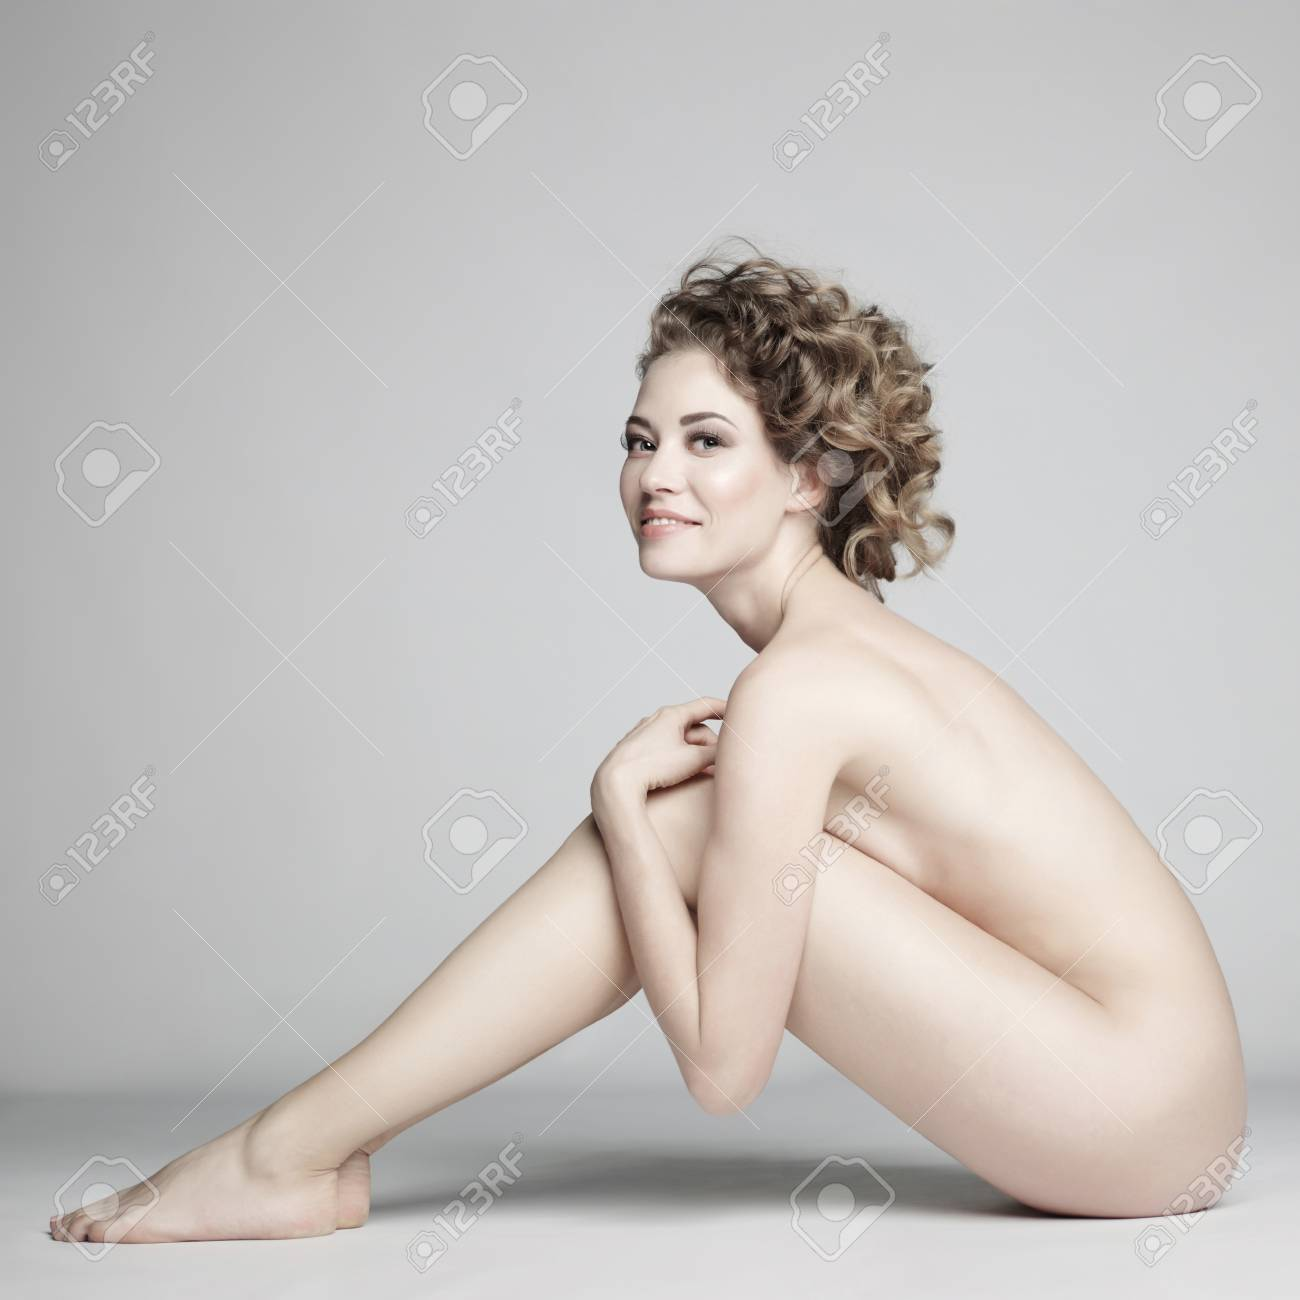 Anal butt free galleries